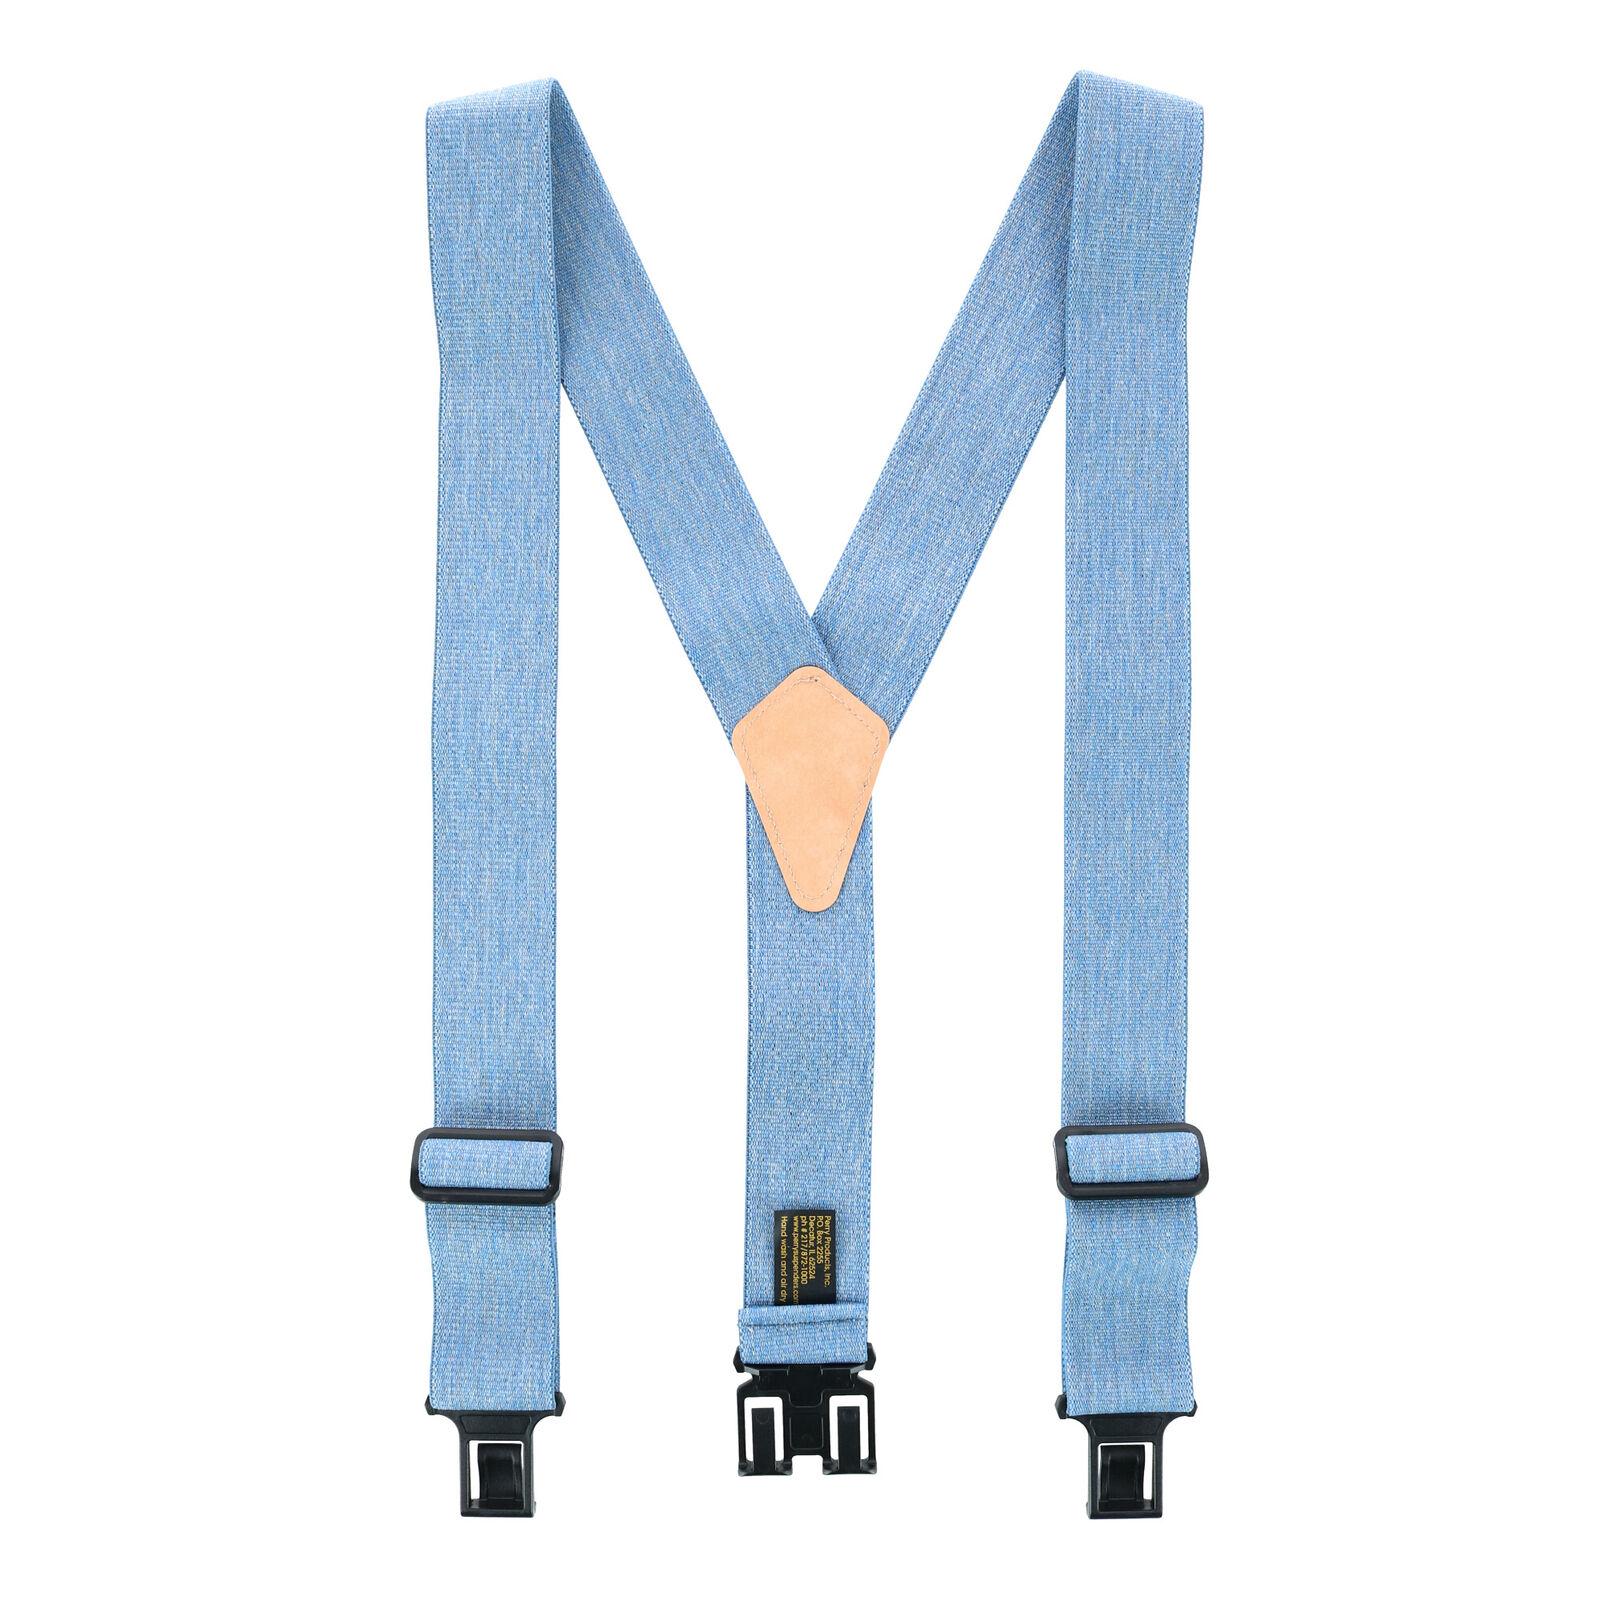 Neu Perry Suspenders Herren Denim Blau Elastisch Haken Ende Hosenträger